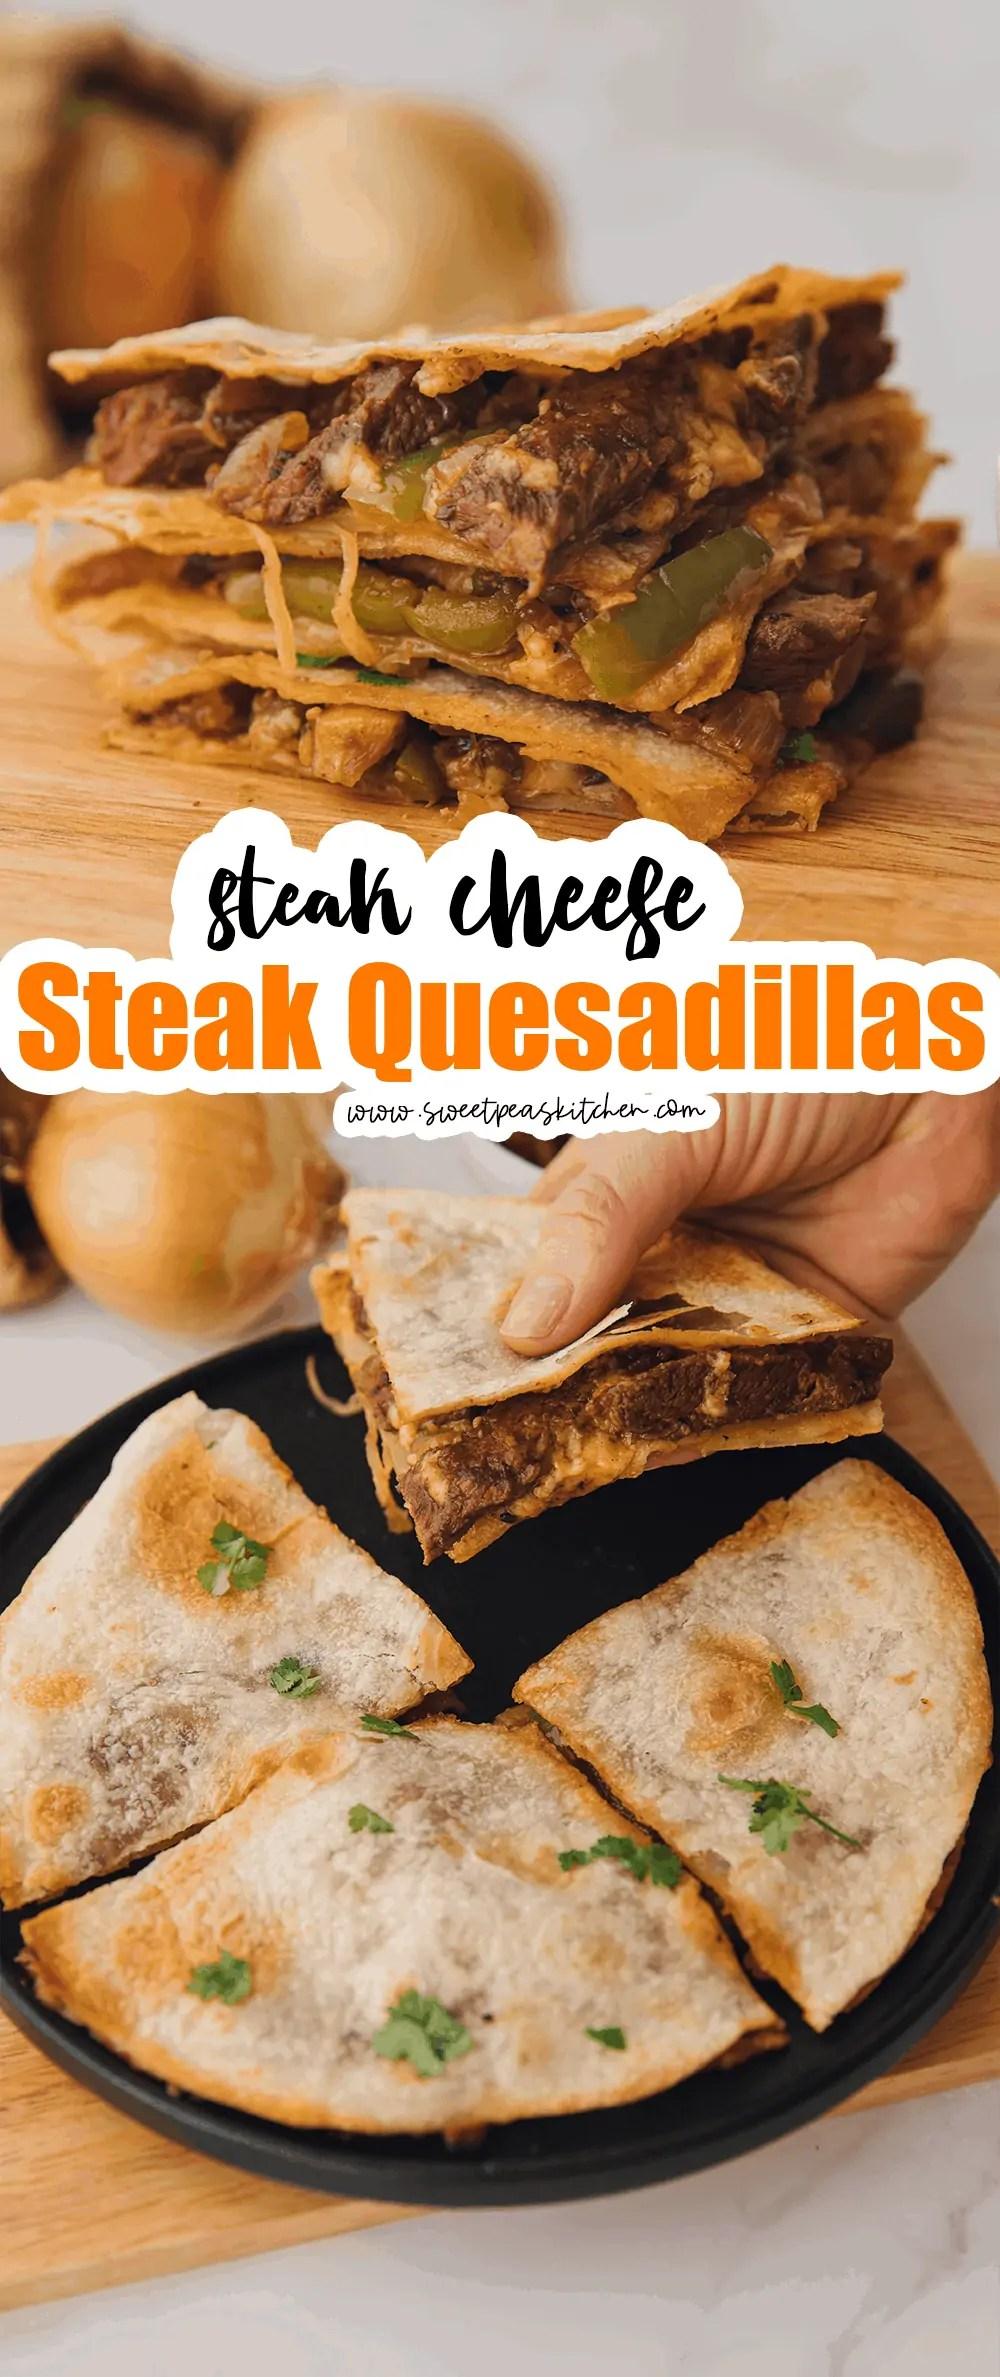 Steak Cheese Steak Quesadillas